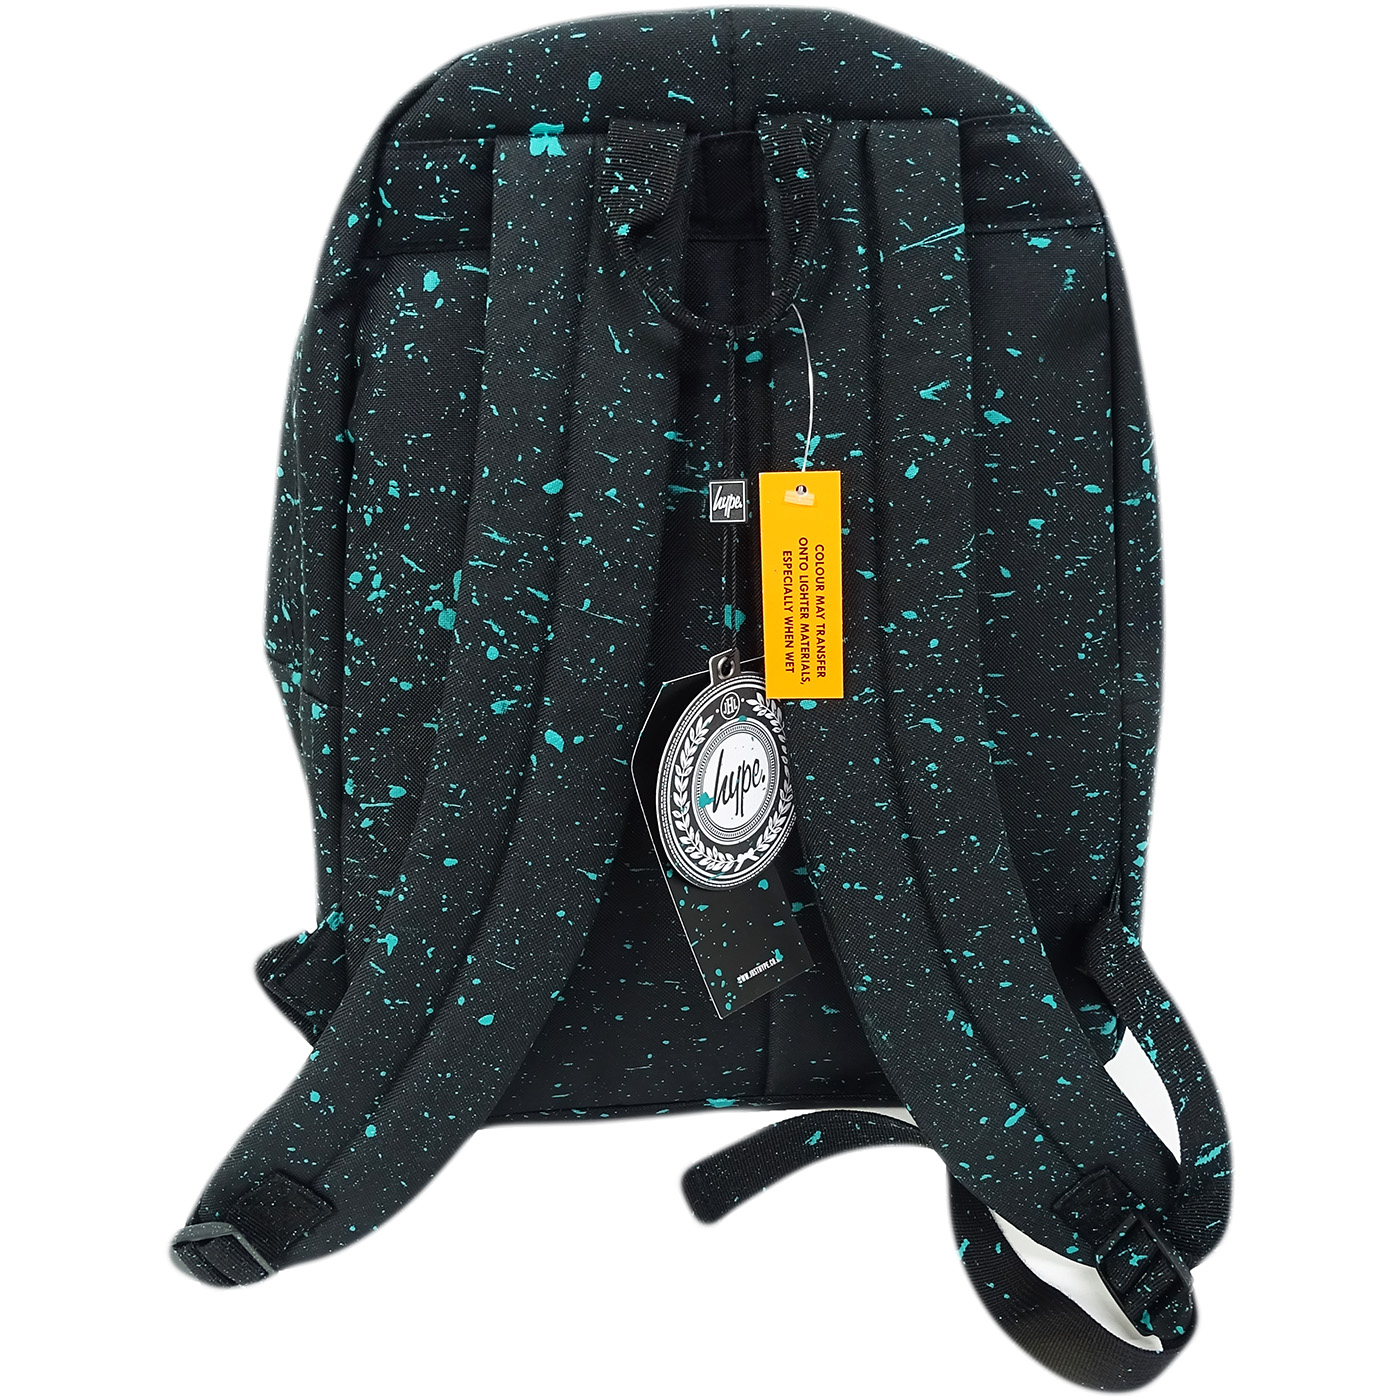 Unisexe-Hype-Sac-A-Dos-Ecole-Gym-SACS-pochettes-pencil-case miniature 192